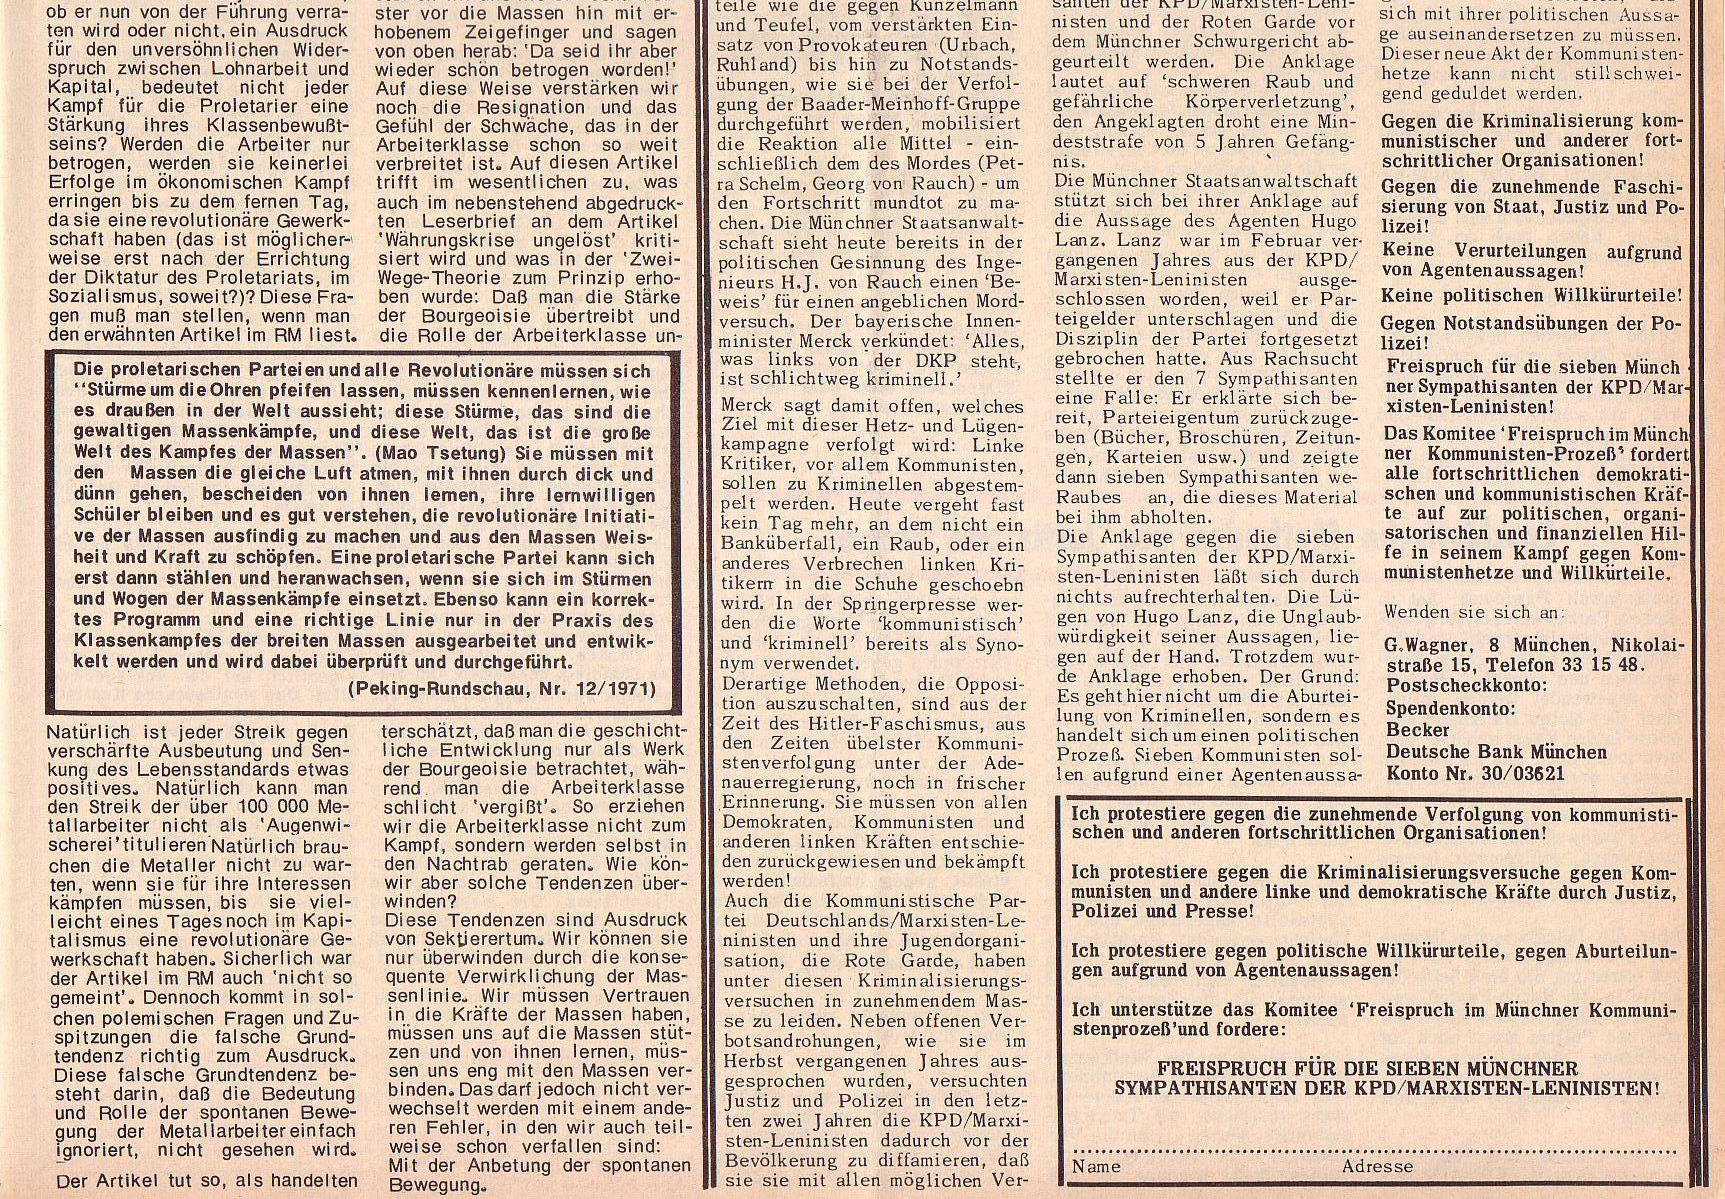 Roter Morgen, 6. Jg., 28. Februar 1972, Nr. 5, Seite 7b